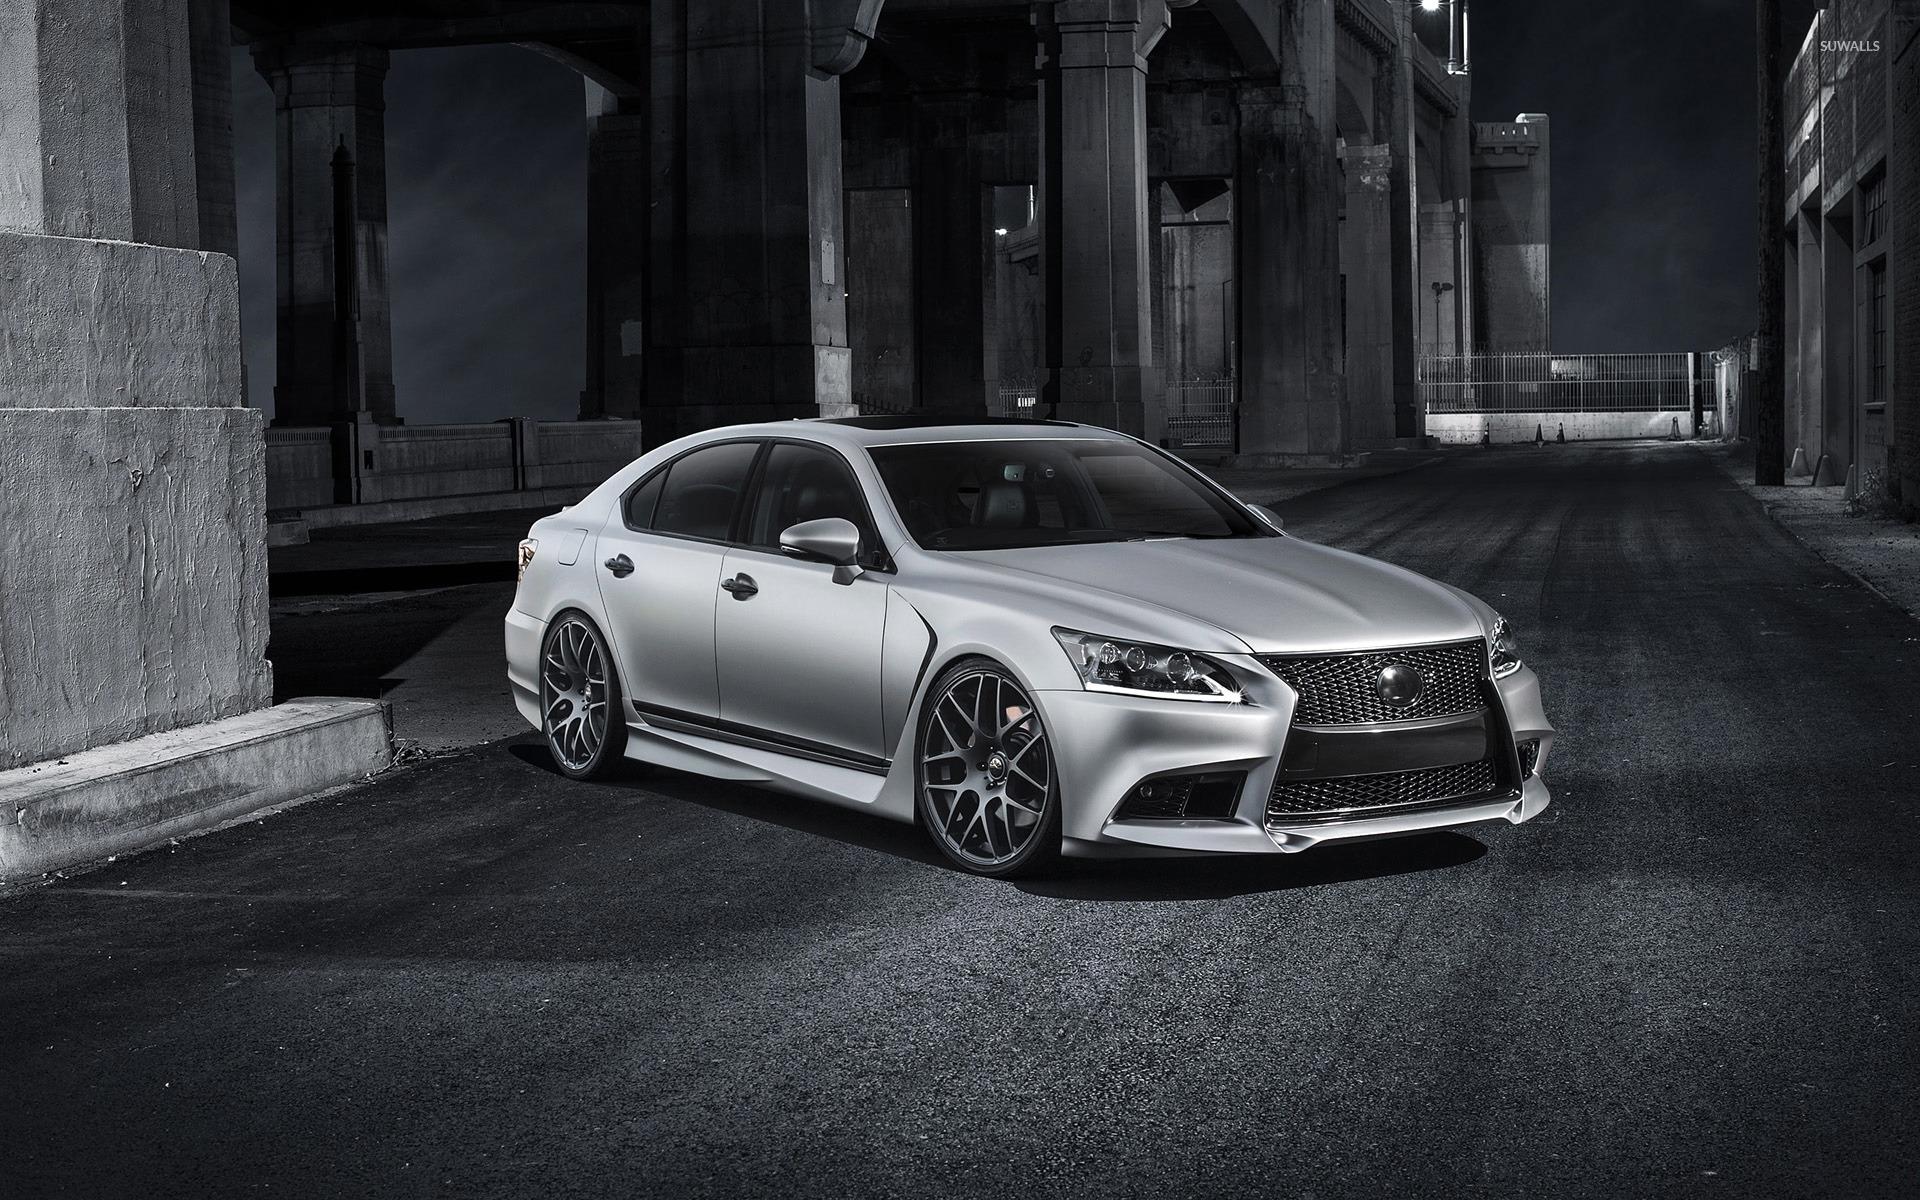 https://cdn.suwalls.com/wallpapers/cars/2013-lexus-ls-460-f-sport-15712-1920x1200.jpg